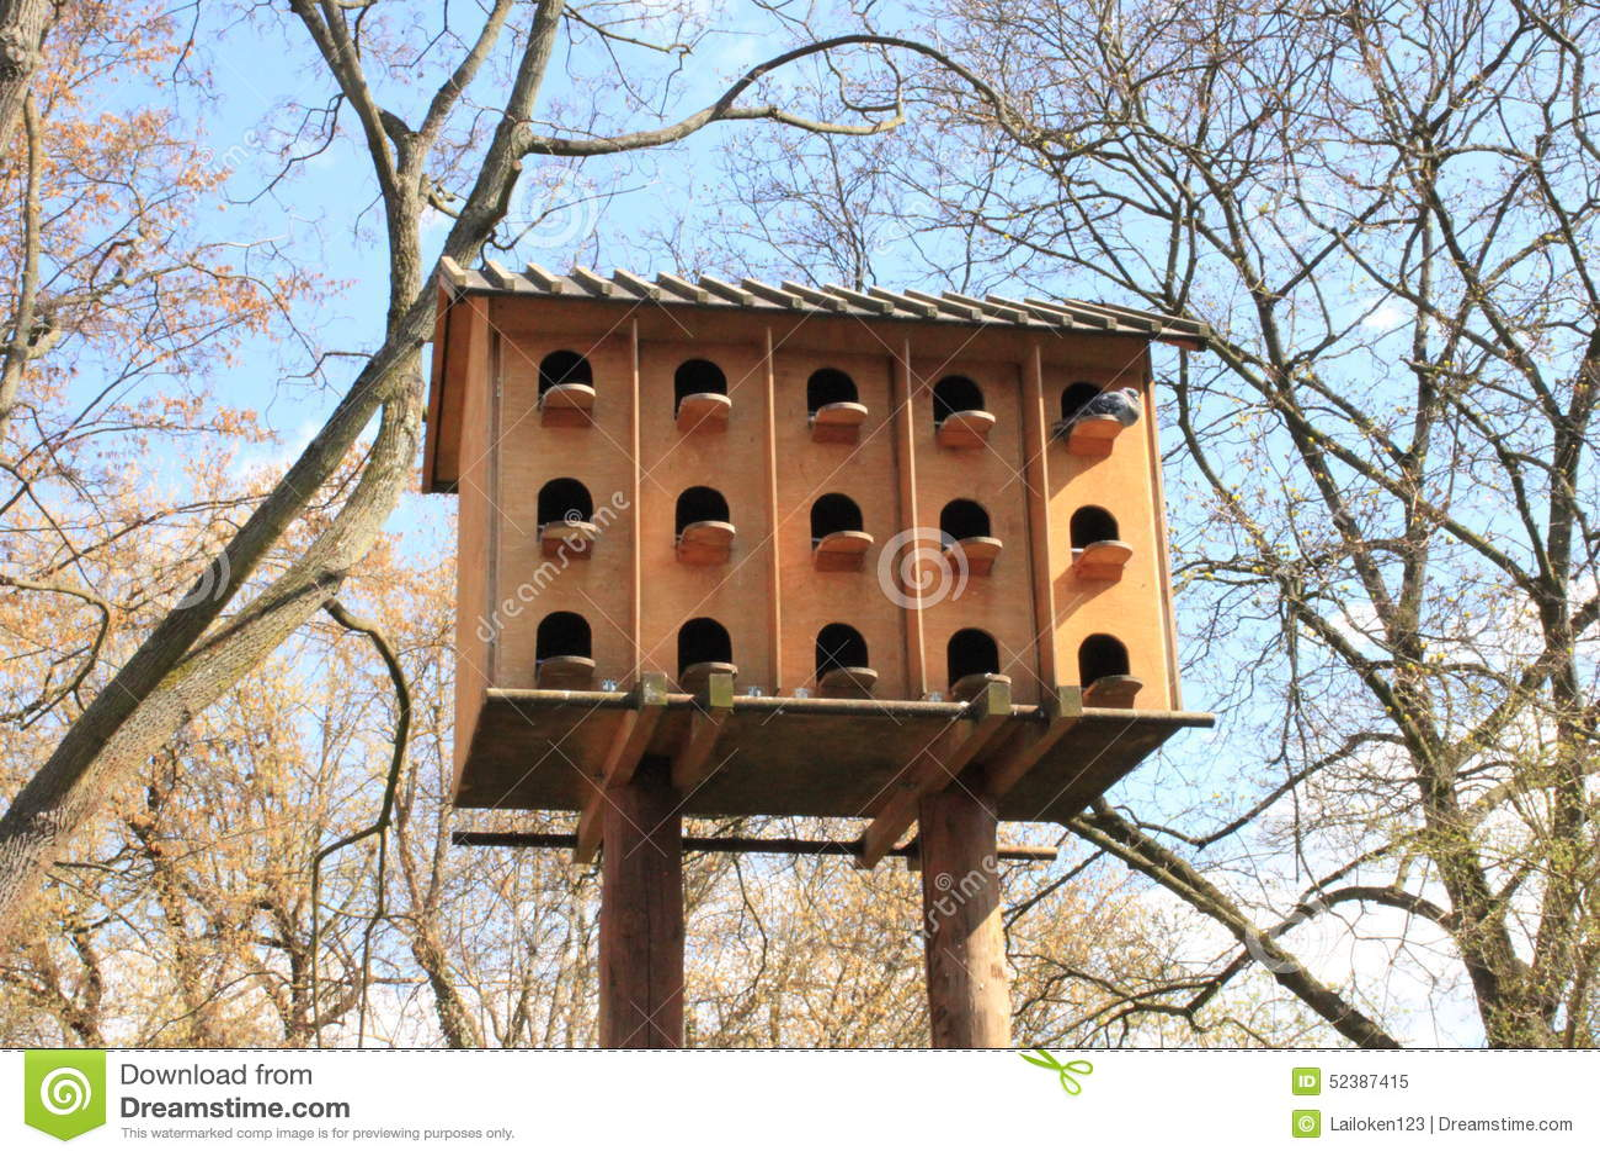 Wooden Dovecote Stock Photo Image 52387415